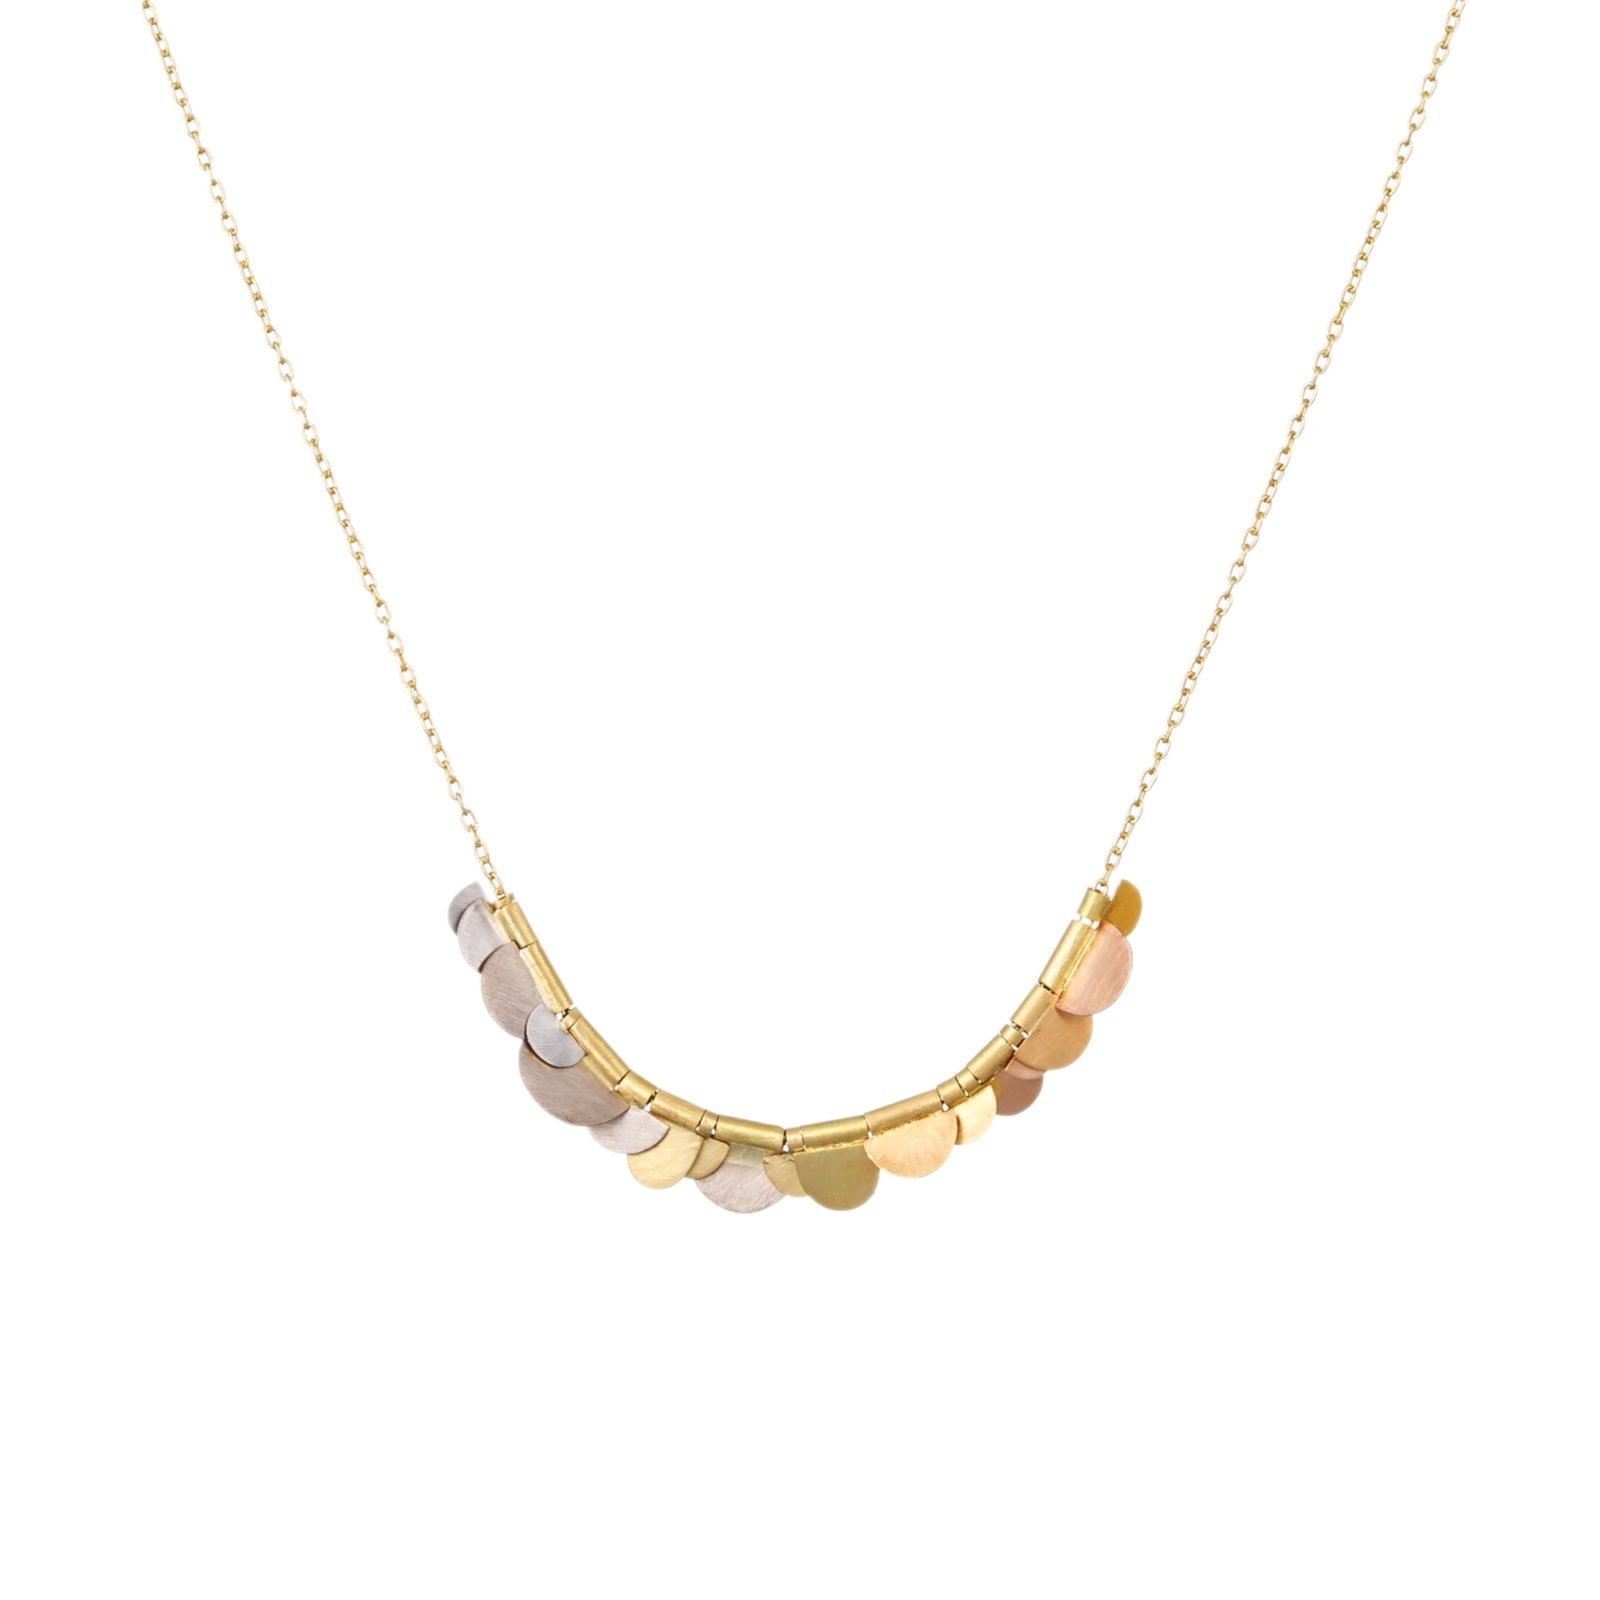 Sia Taylor KN2 YRAIN Rainbow Golds Flora Necklace WB